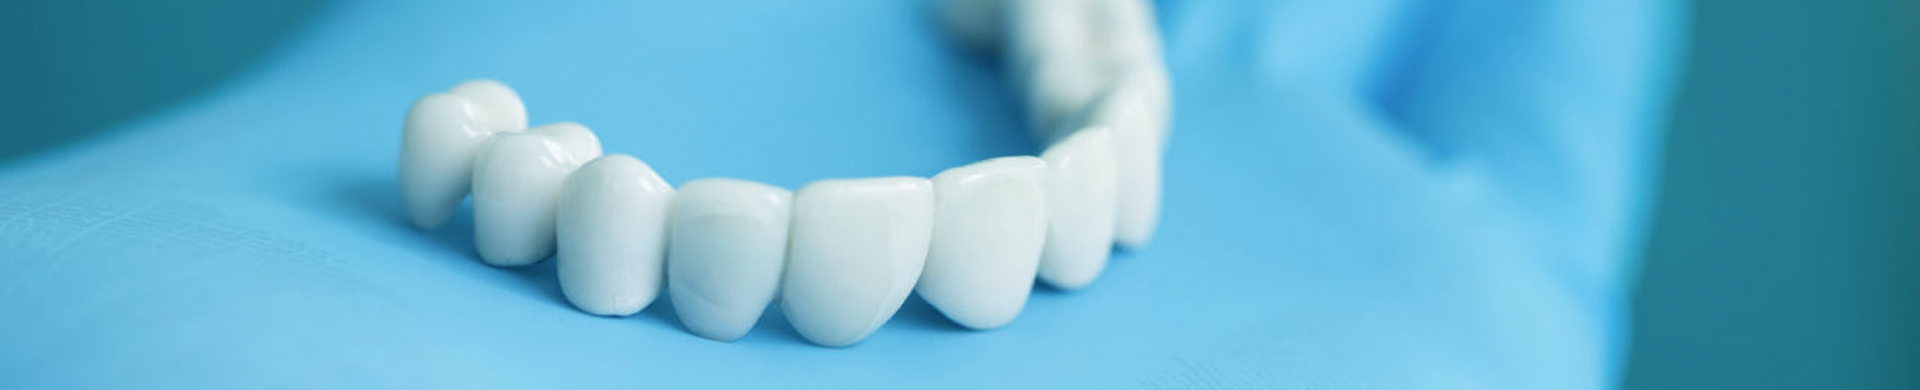 Dentist m